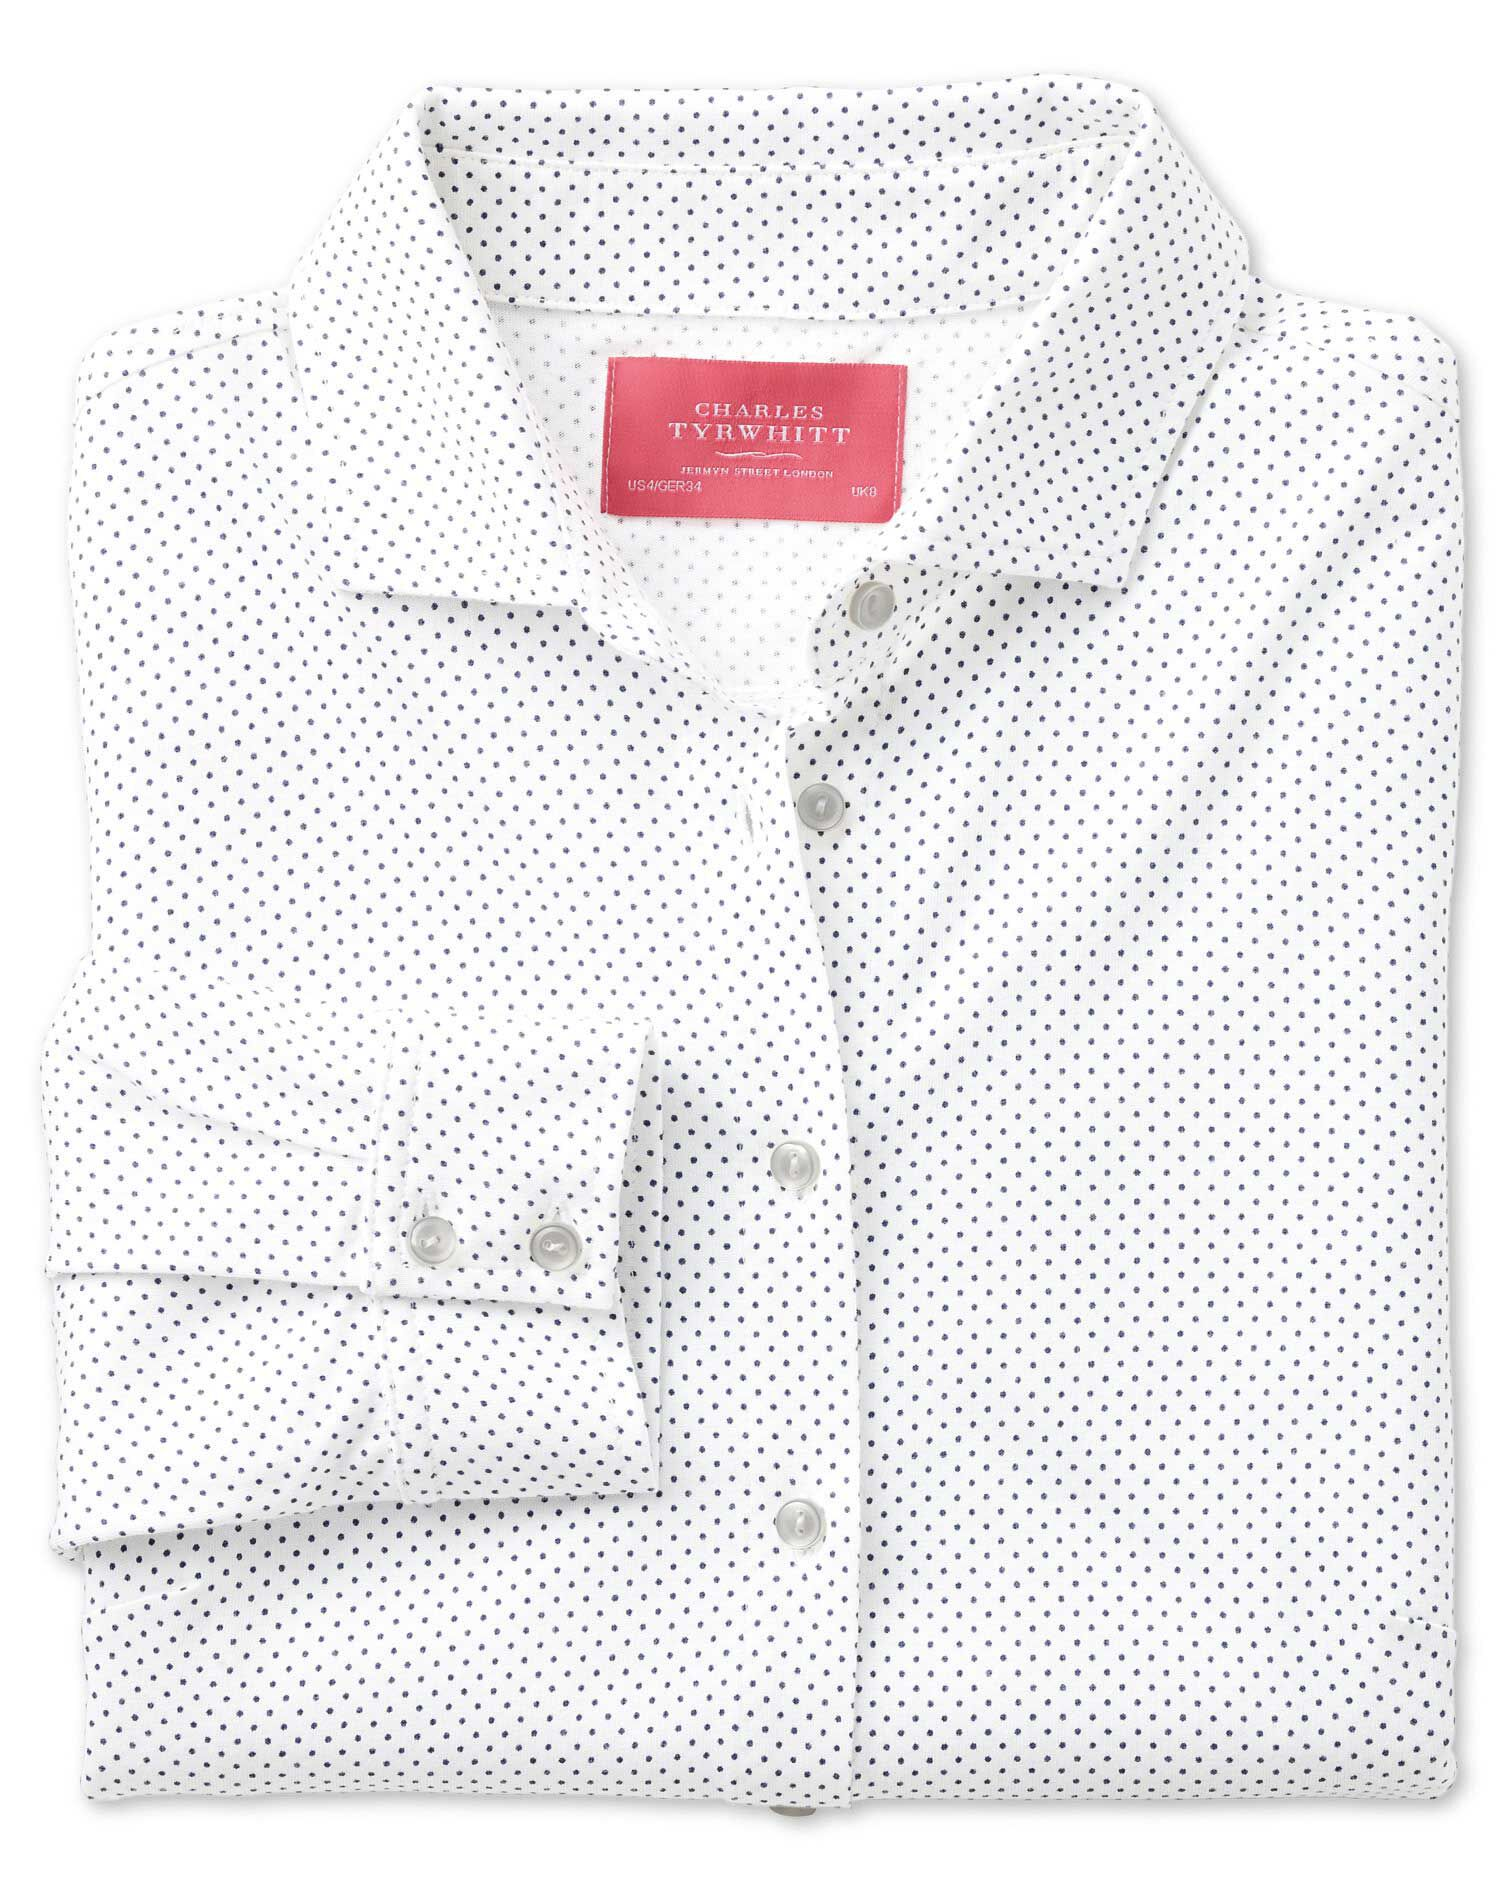 White Pindot Print Jersey Cotton Shirt Size 16 by Charles Tyrwhitt